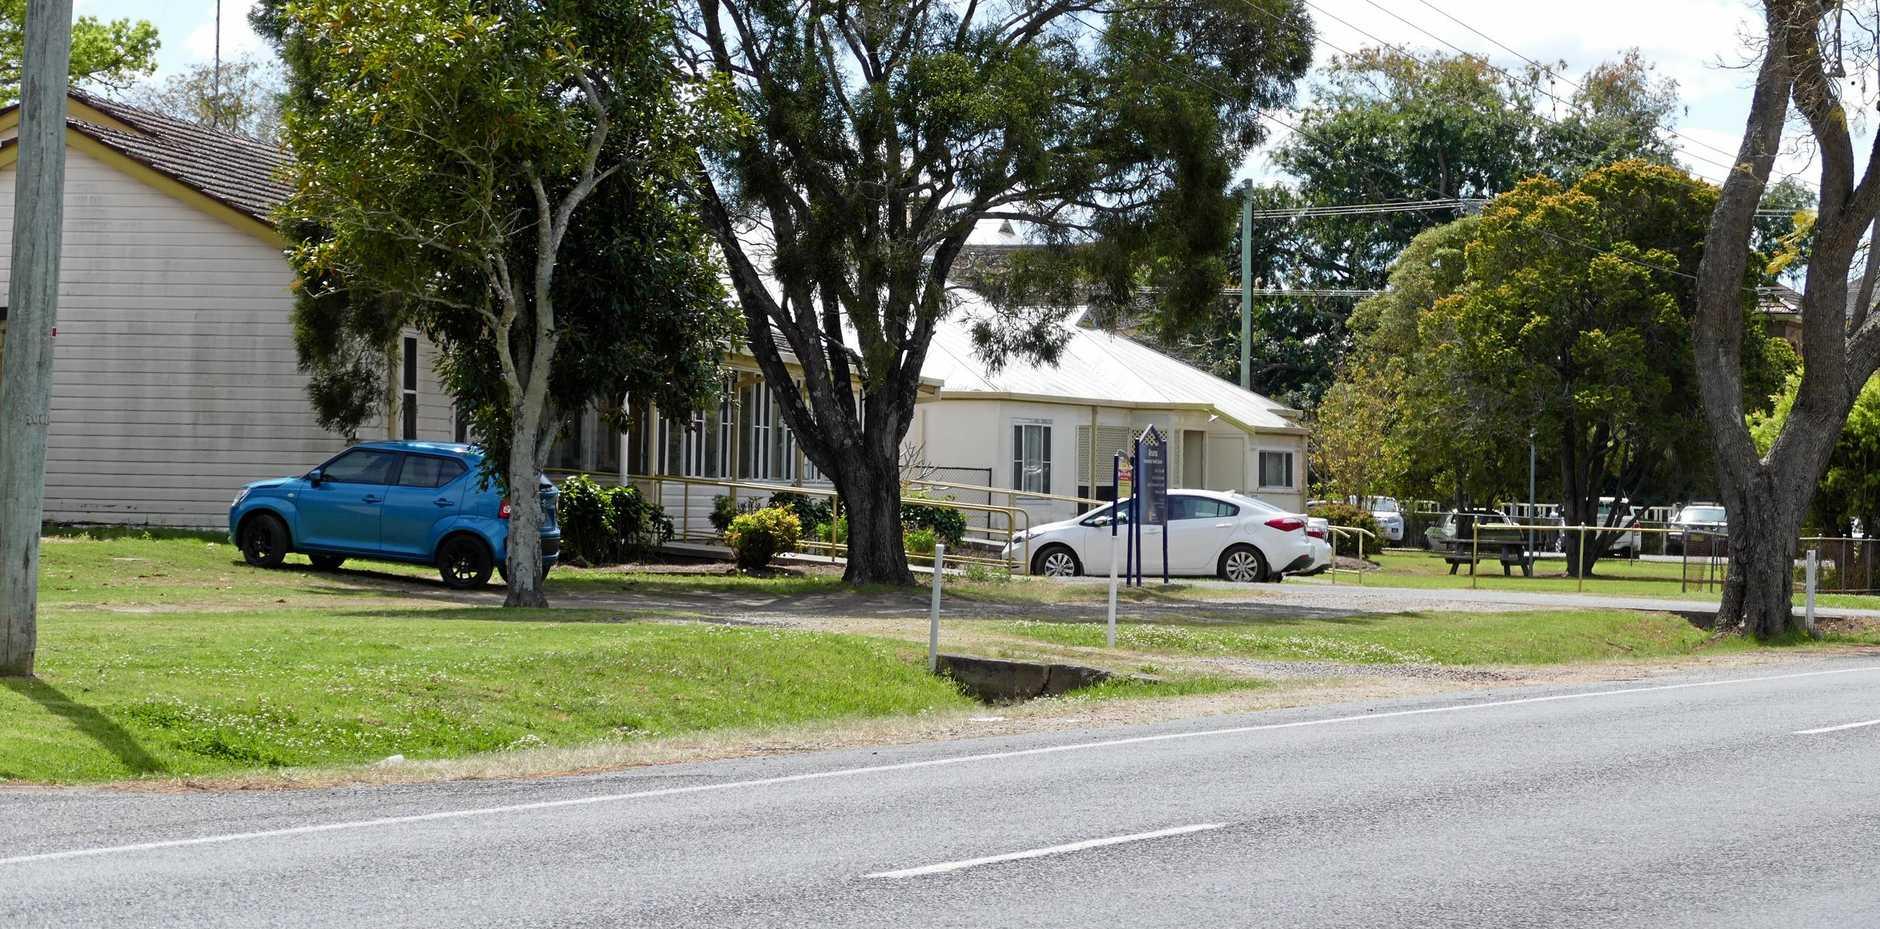 The Aruma buildings which house Grafton Community Health and the Aruma Dental Clinic.